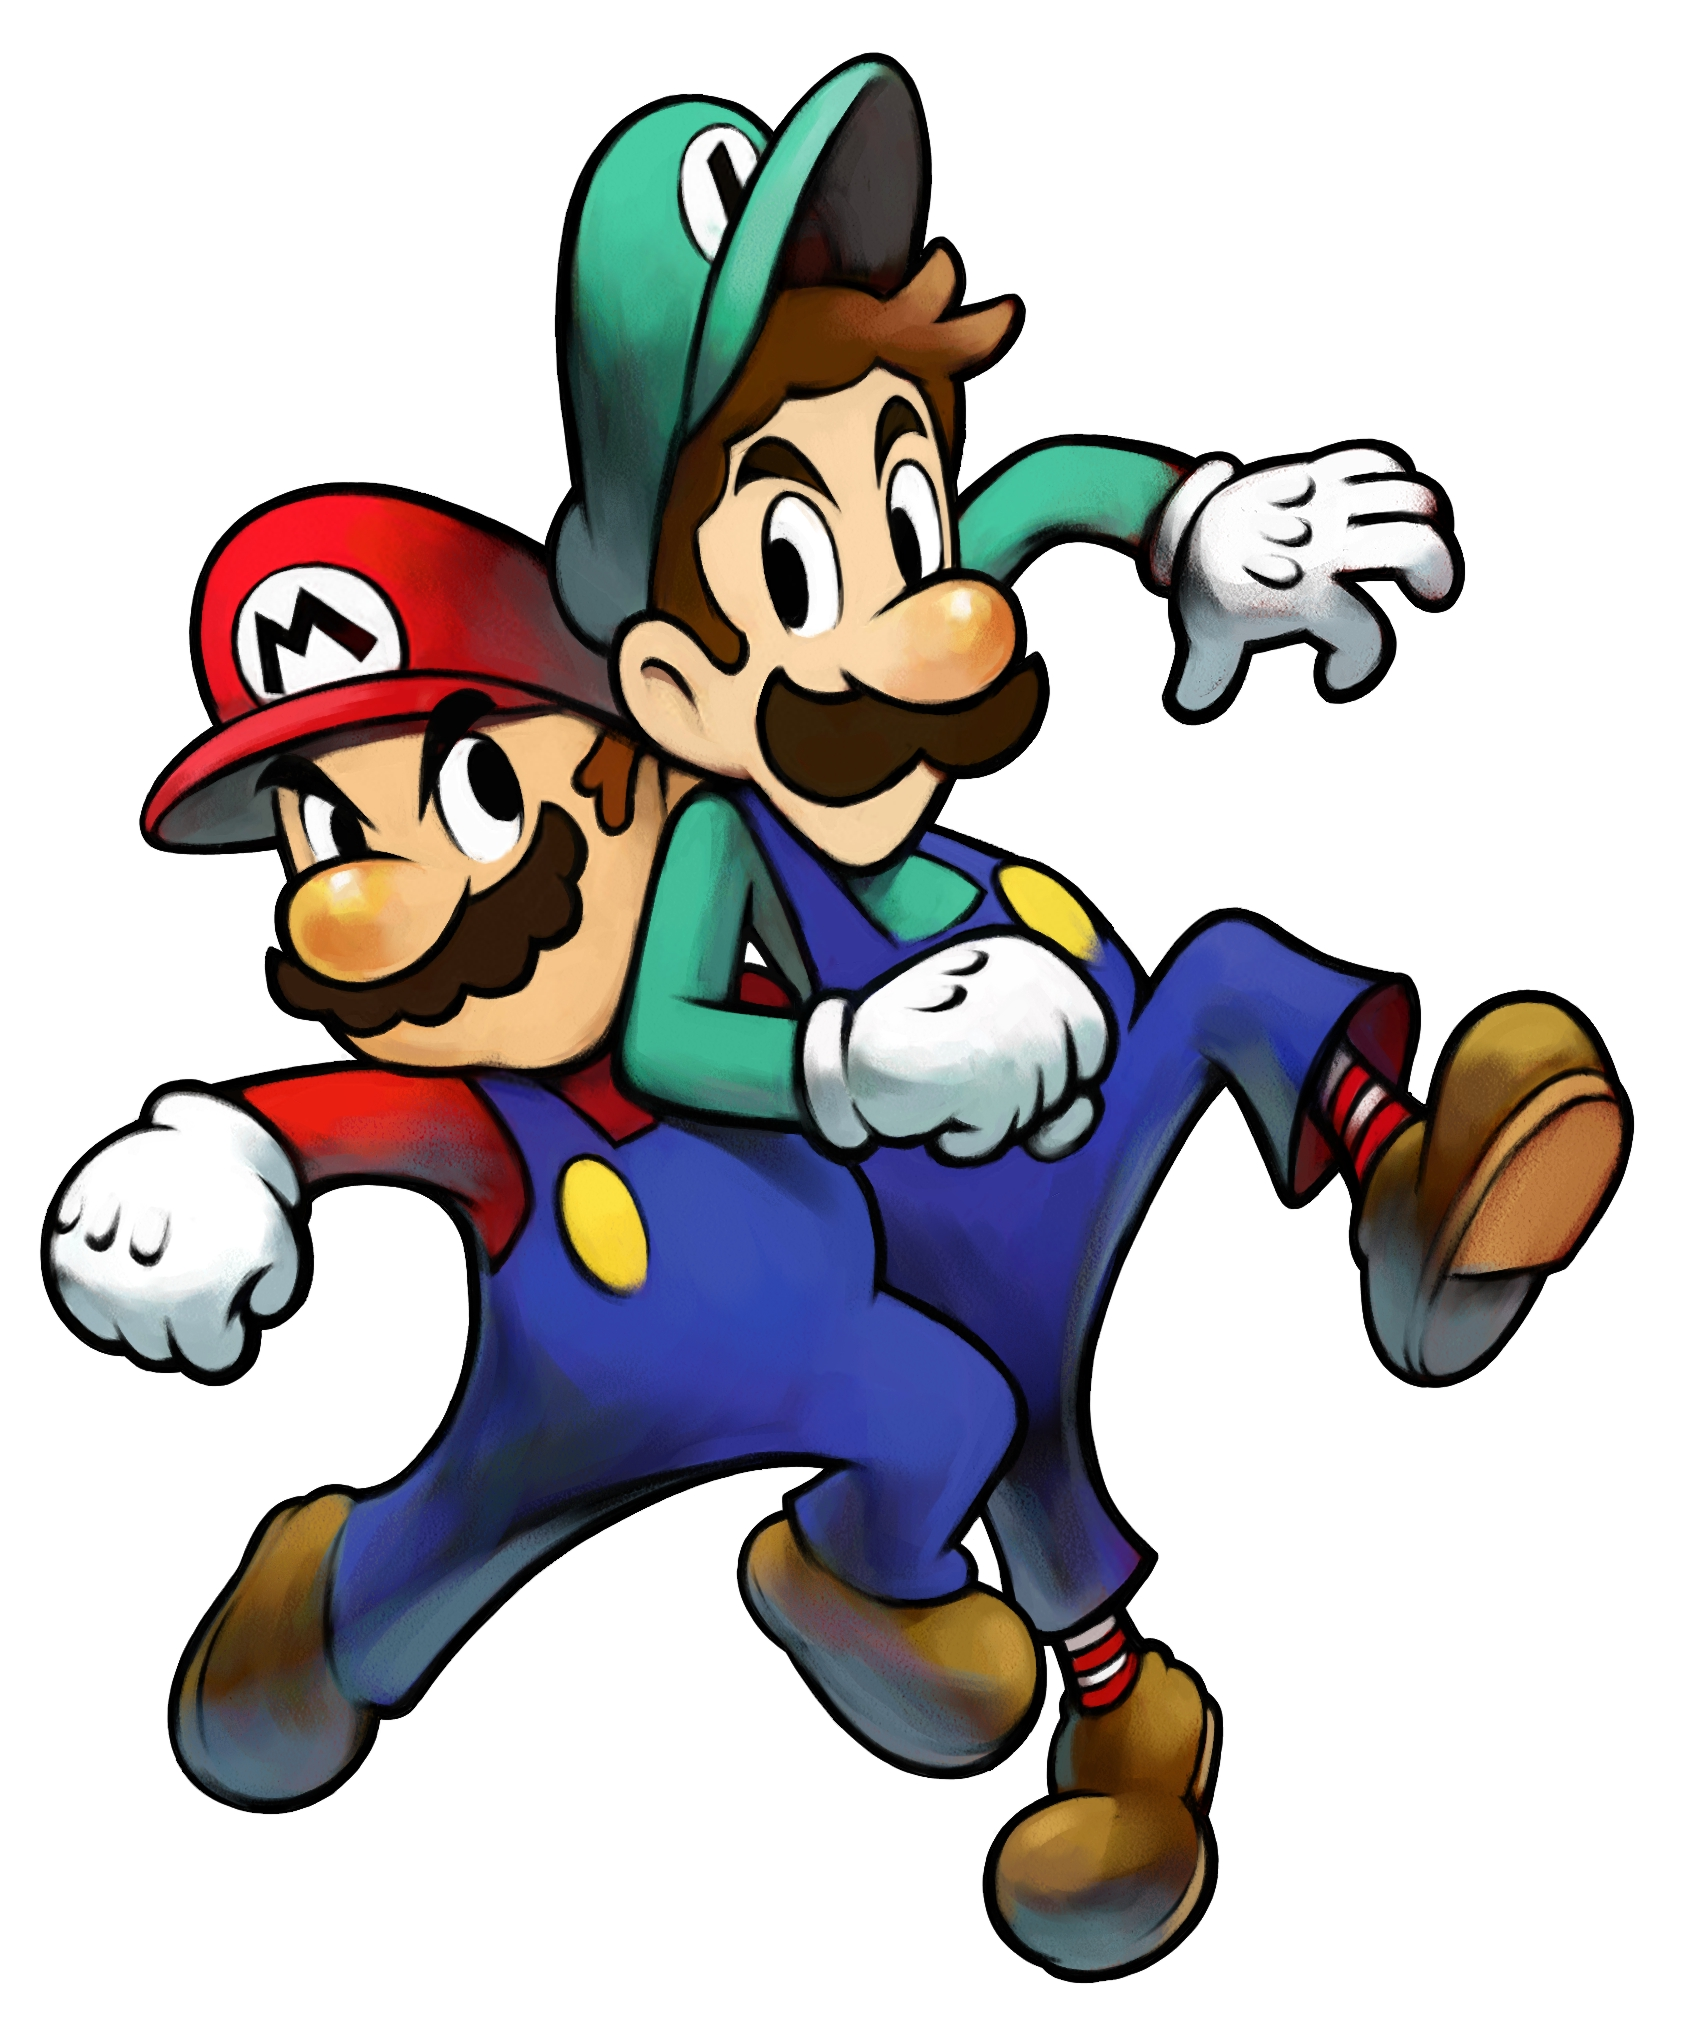 Tmk Downloads Images Mario Luigi Superstar Saga Gba